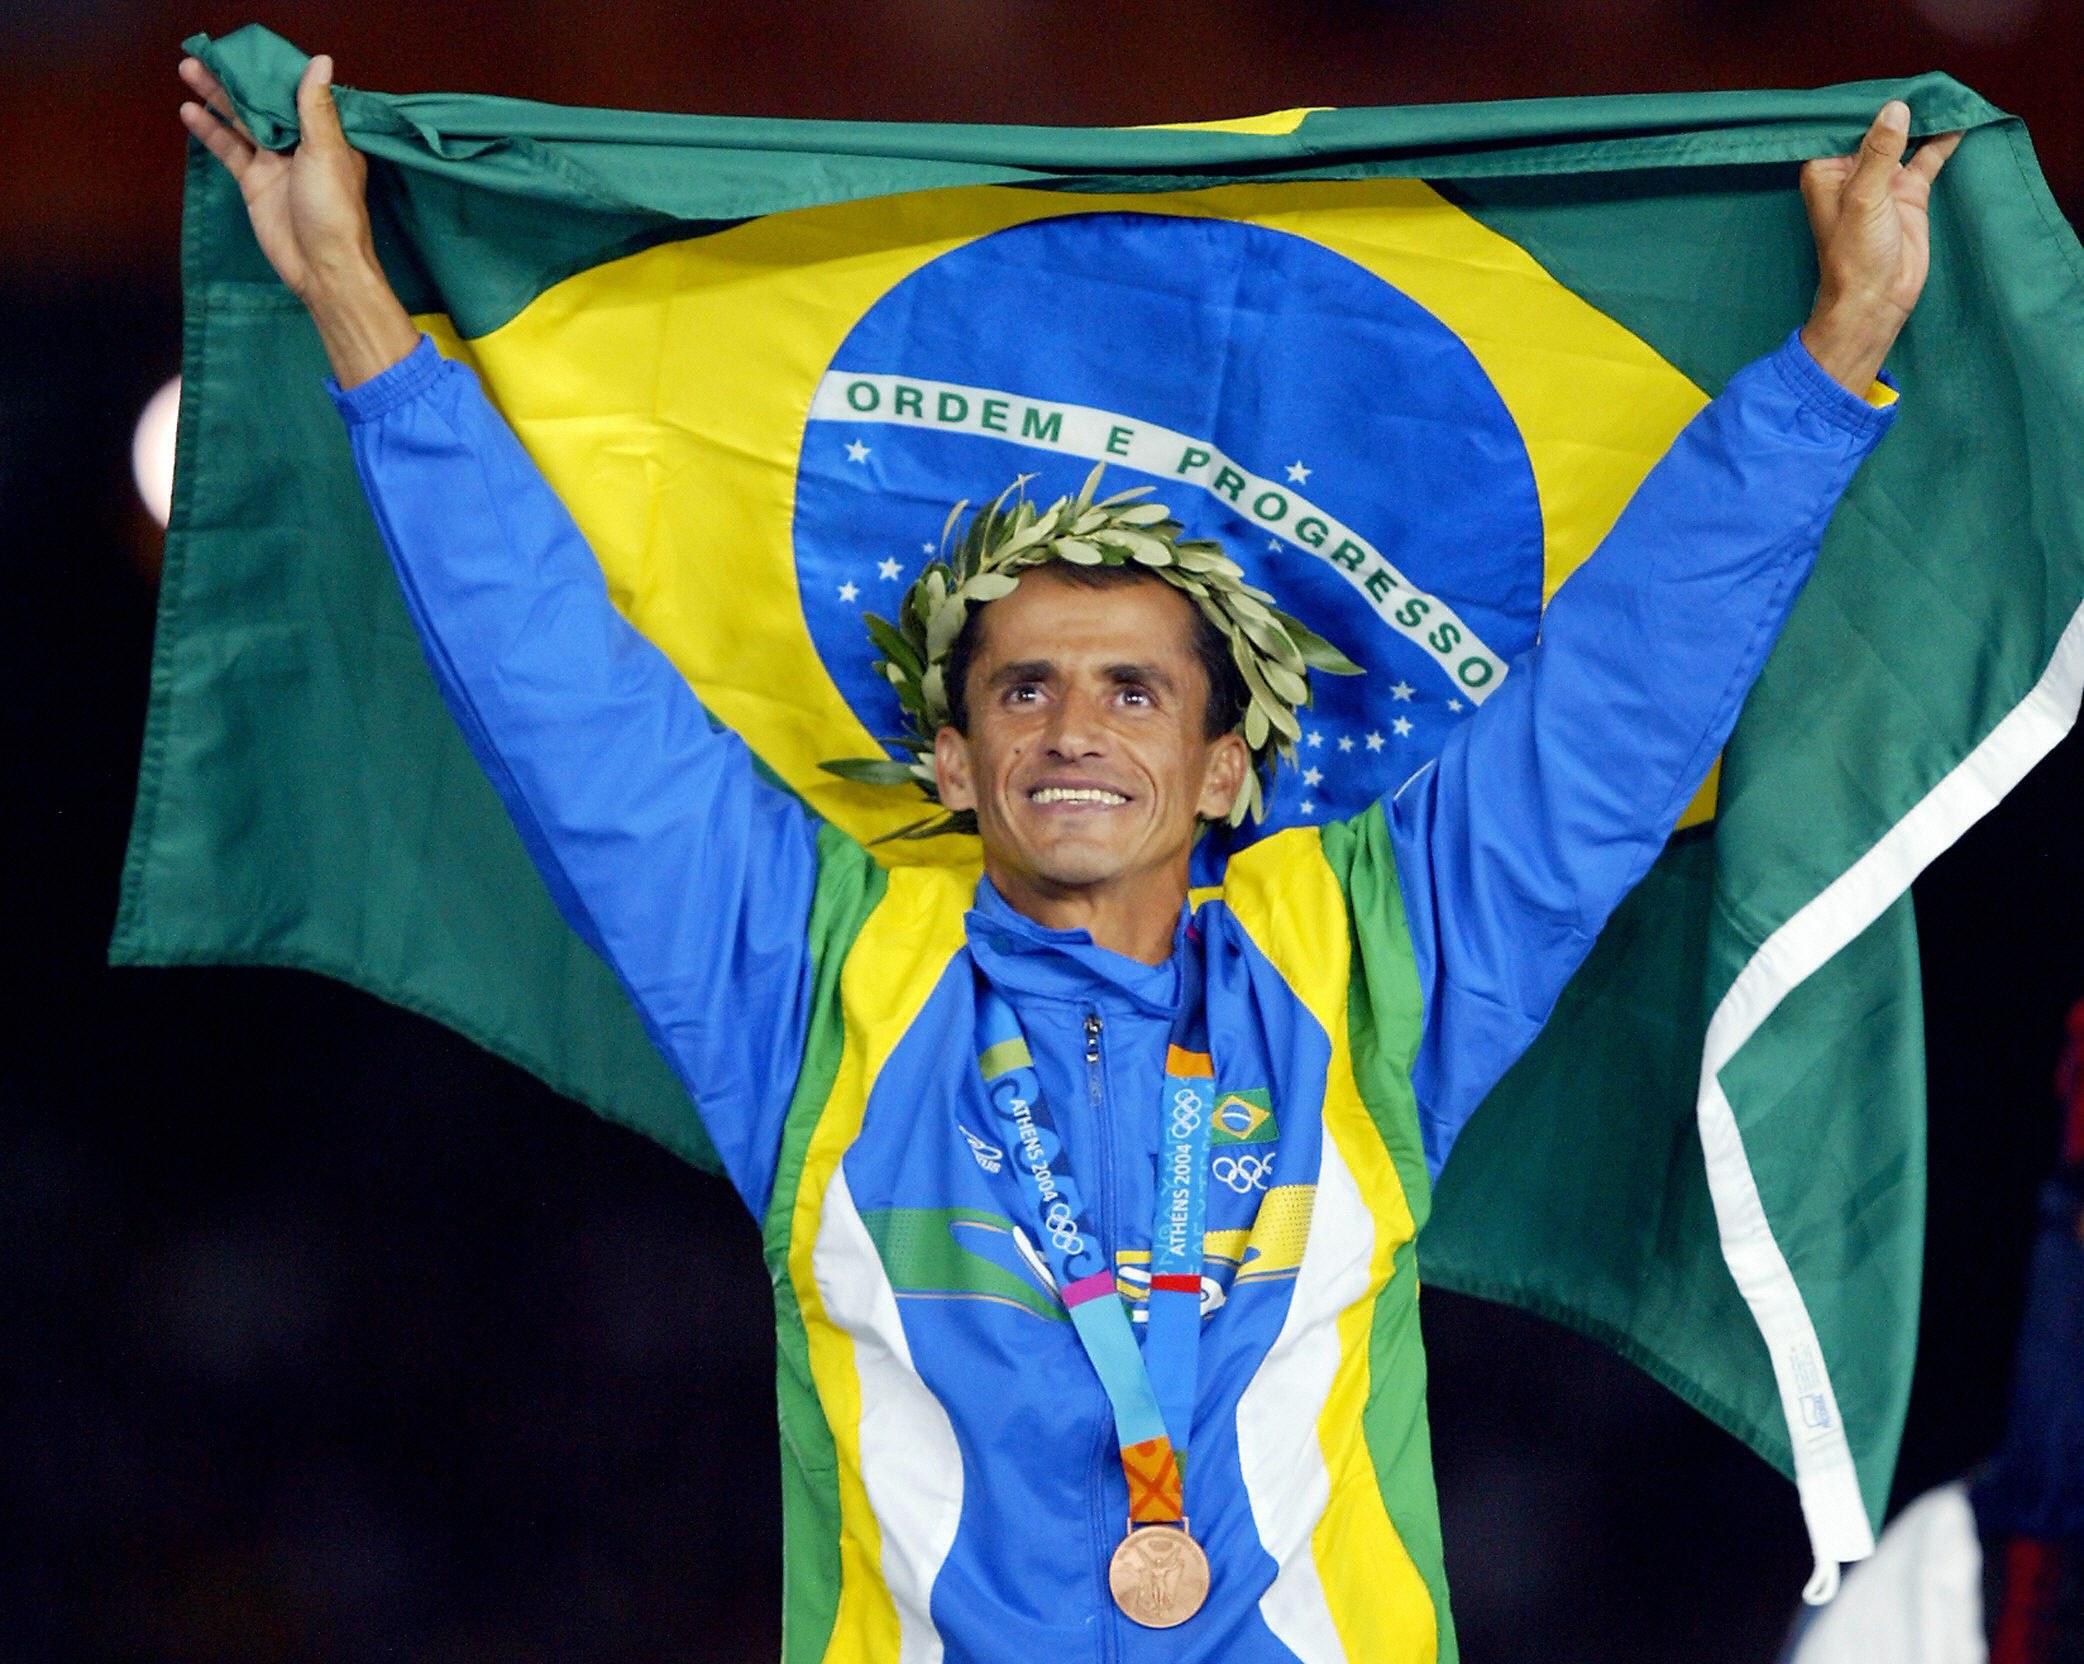 11 de Agosto - Vanderlei Cordeiro de Lima, ex-maratonista brasileiro.jpg